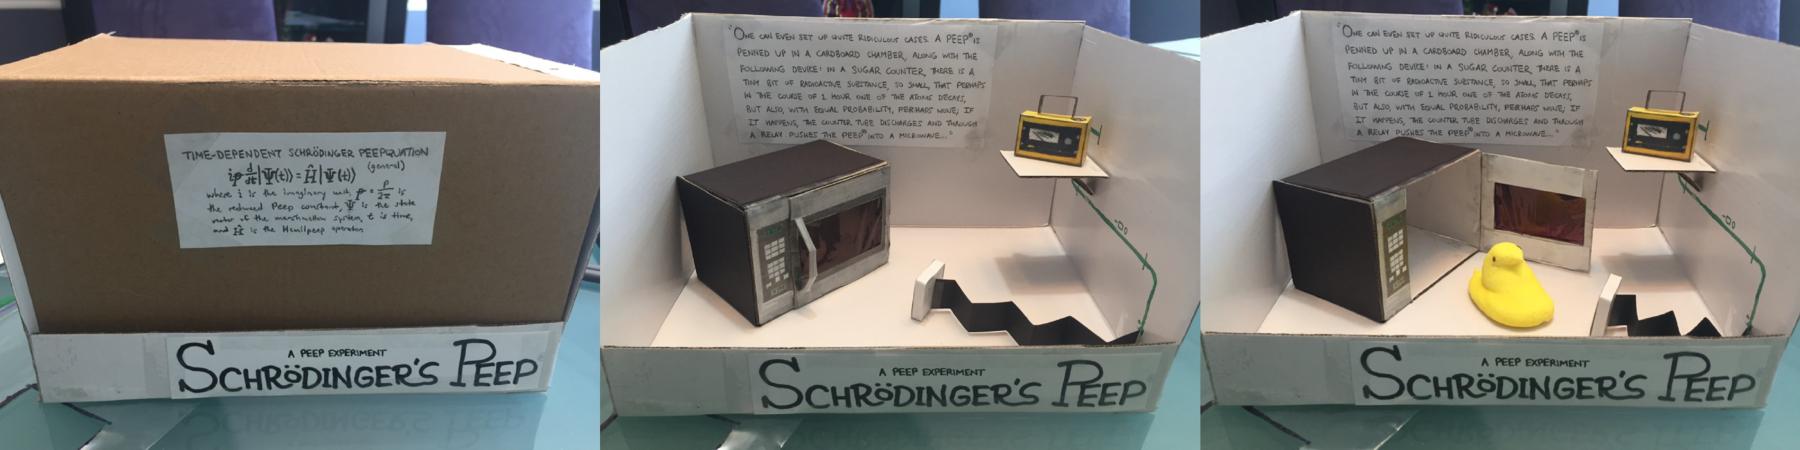 Schrödinger's Peep